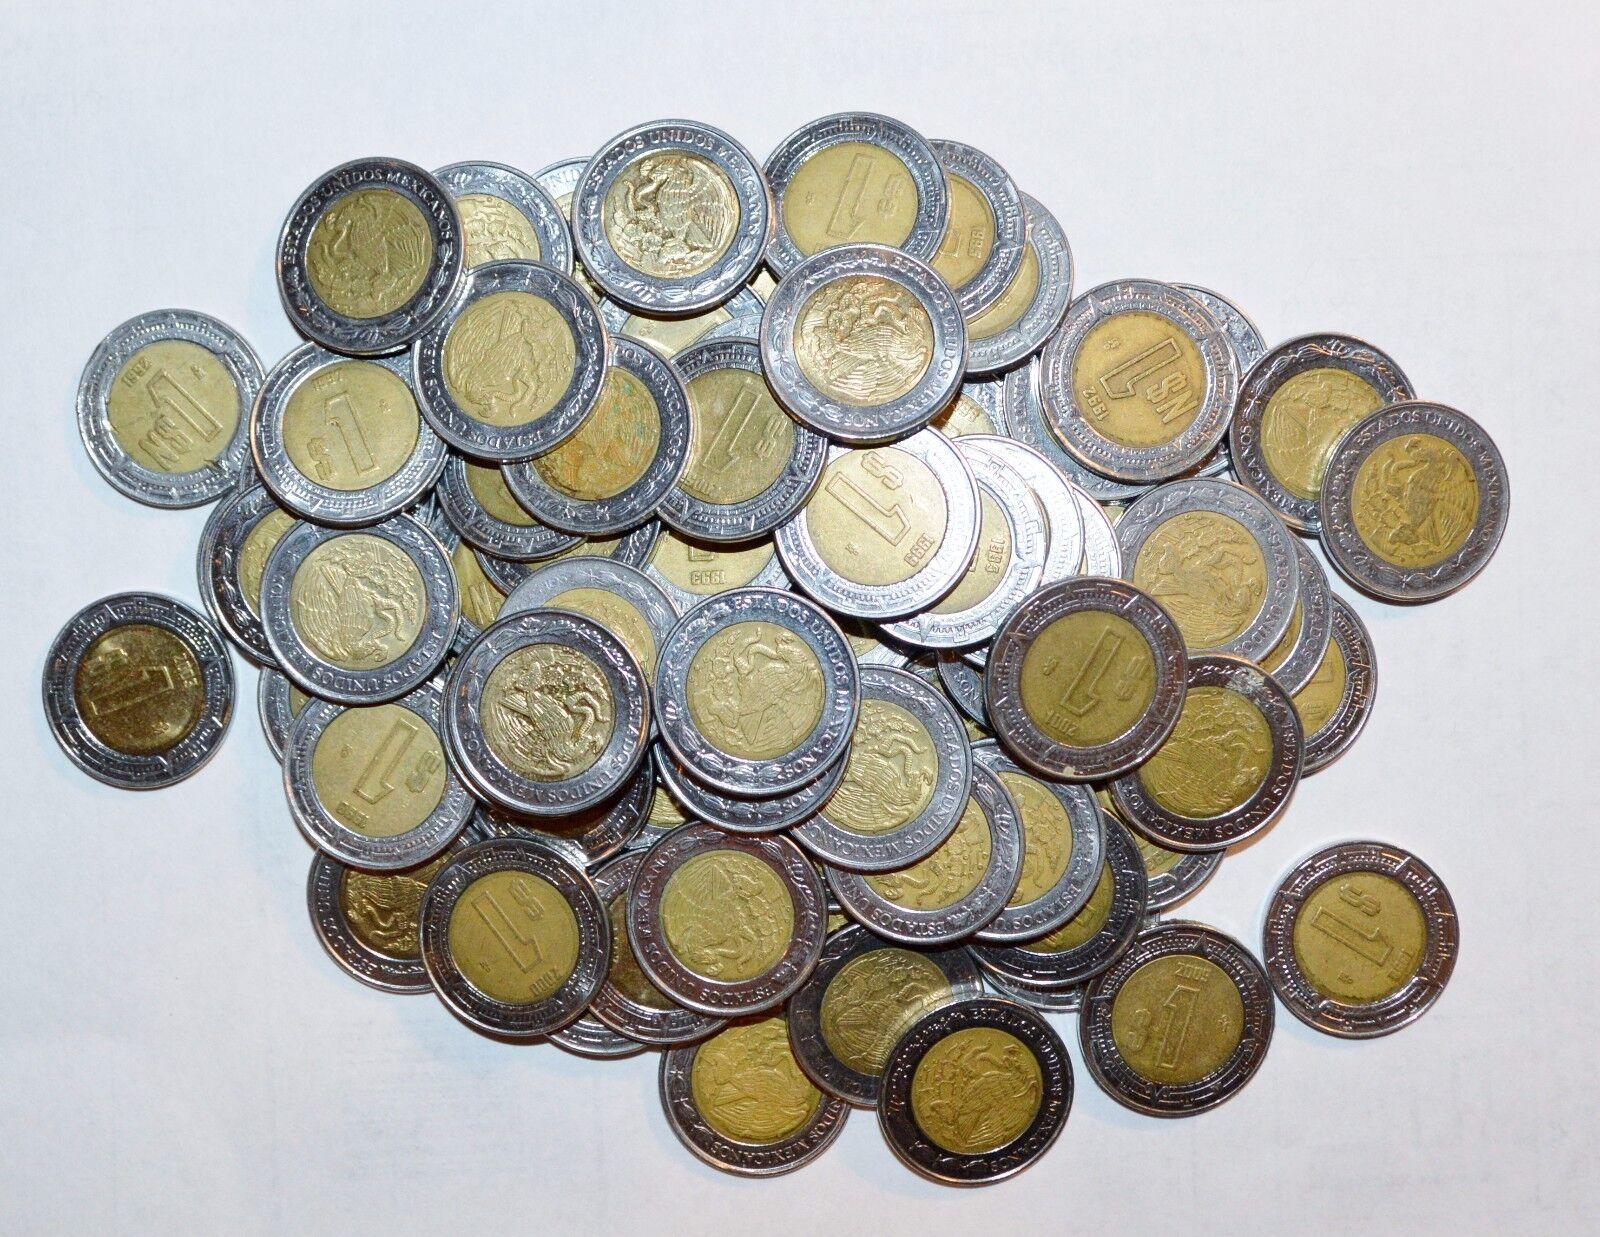 MEXICO lot BIMETALLIC 1 $1 PESO unsearched world un snake 5 coins